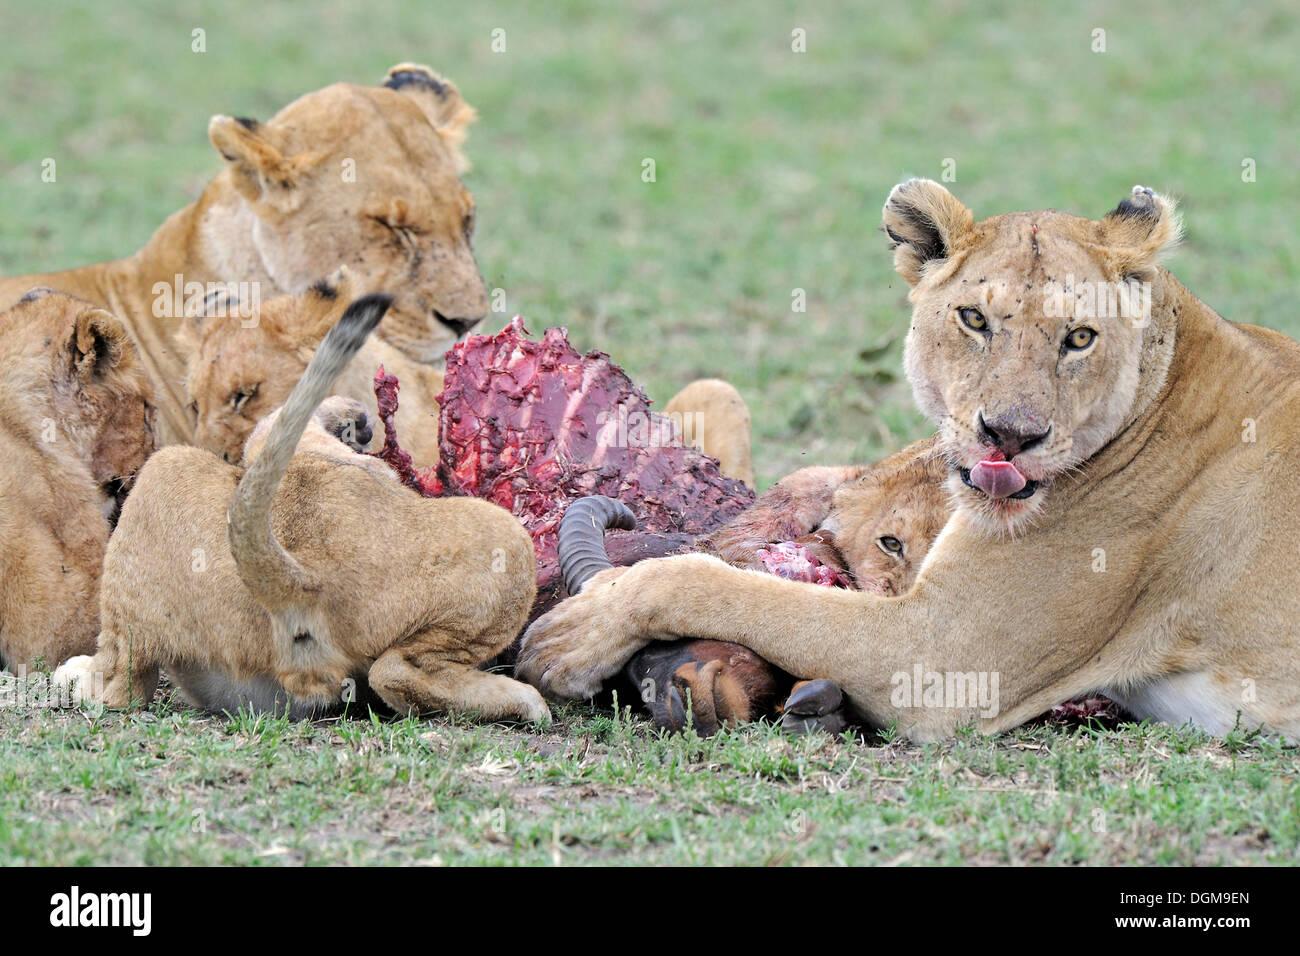 Family of lions (Panthera leo), eating a common tsessebe (Damaliscus lunatus), Maasai Mara National Reserve, Kenya, East Africa - Stock Image